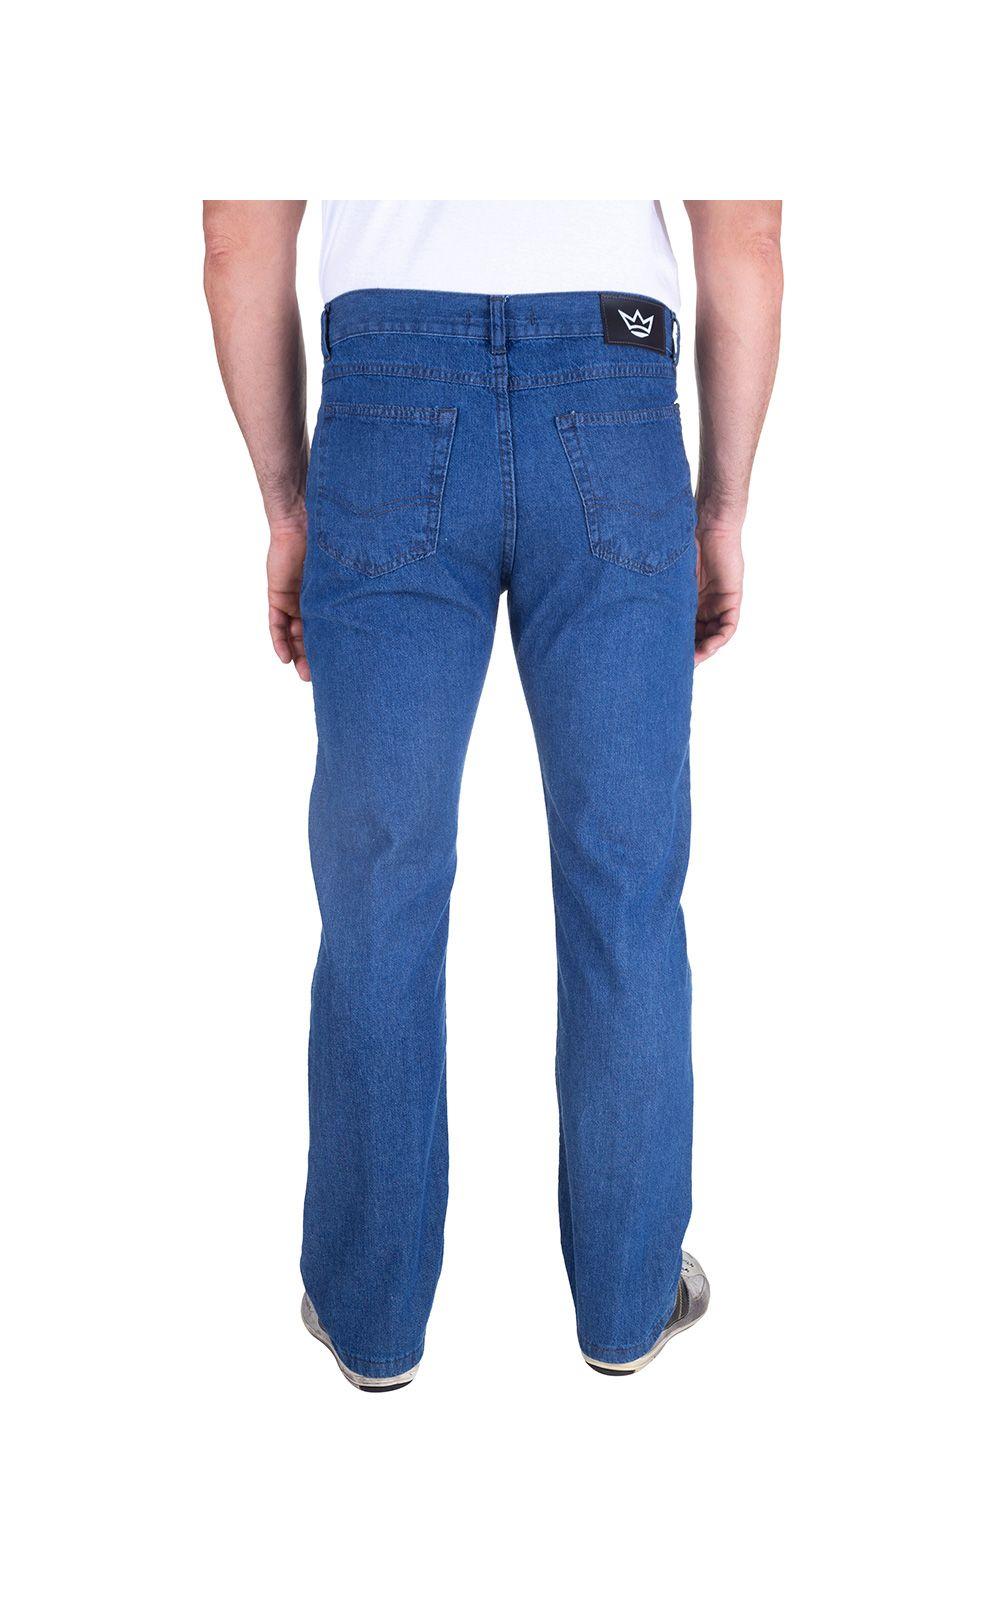 Foto 2 - Calça Jeans Masculina Azul Claro Lisa